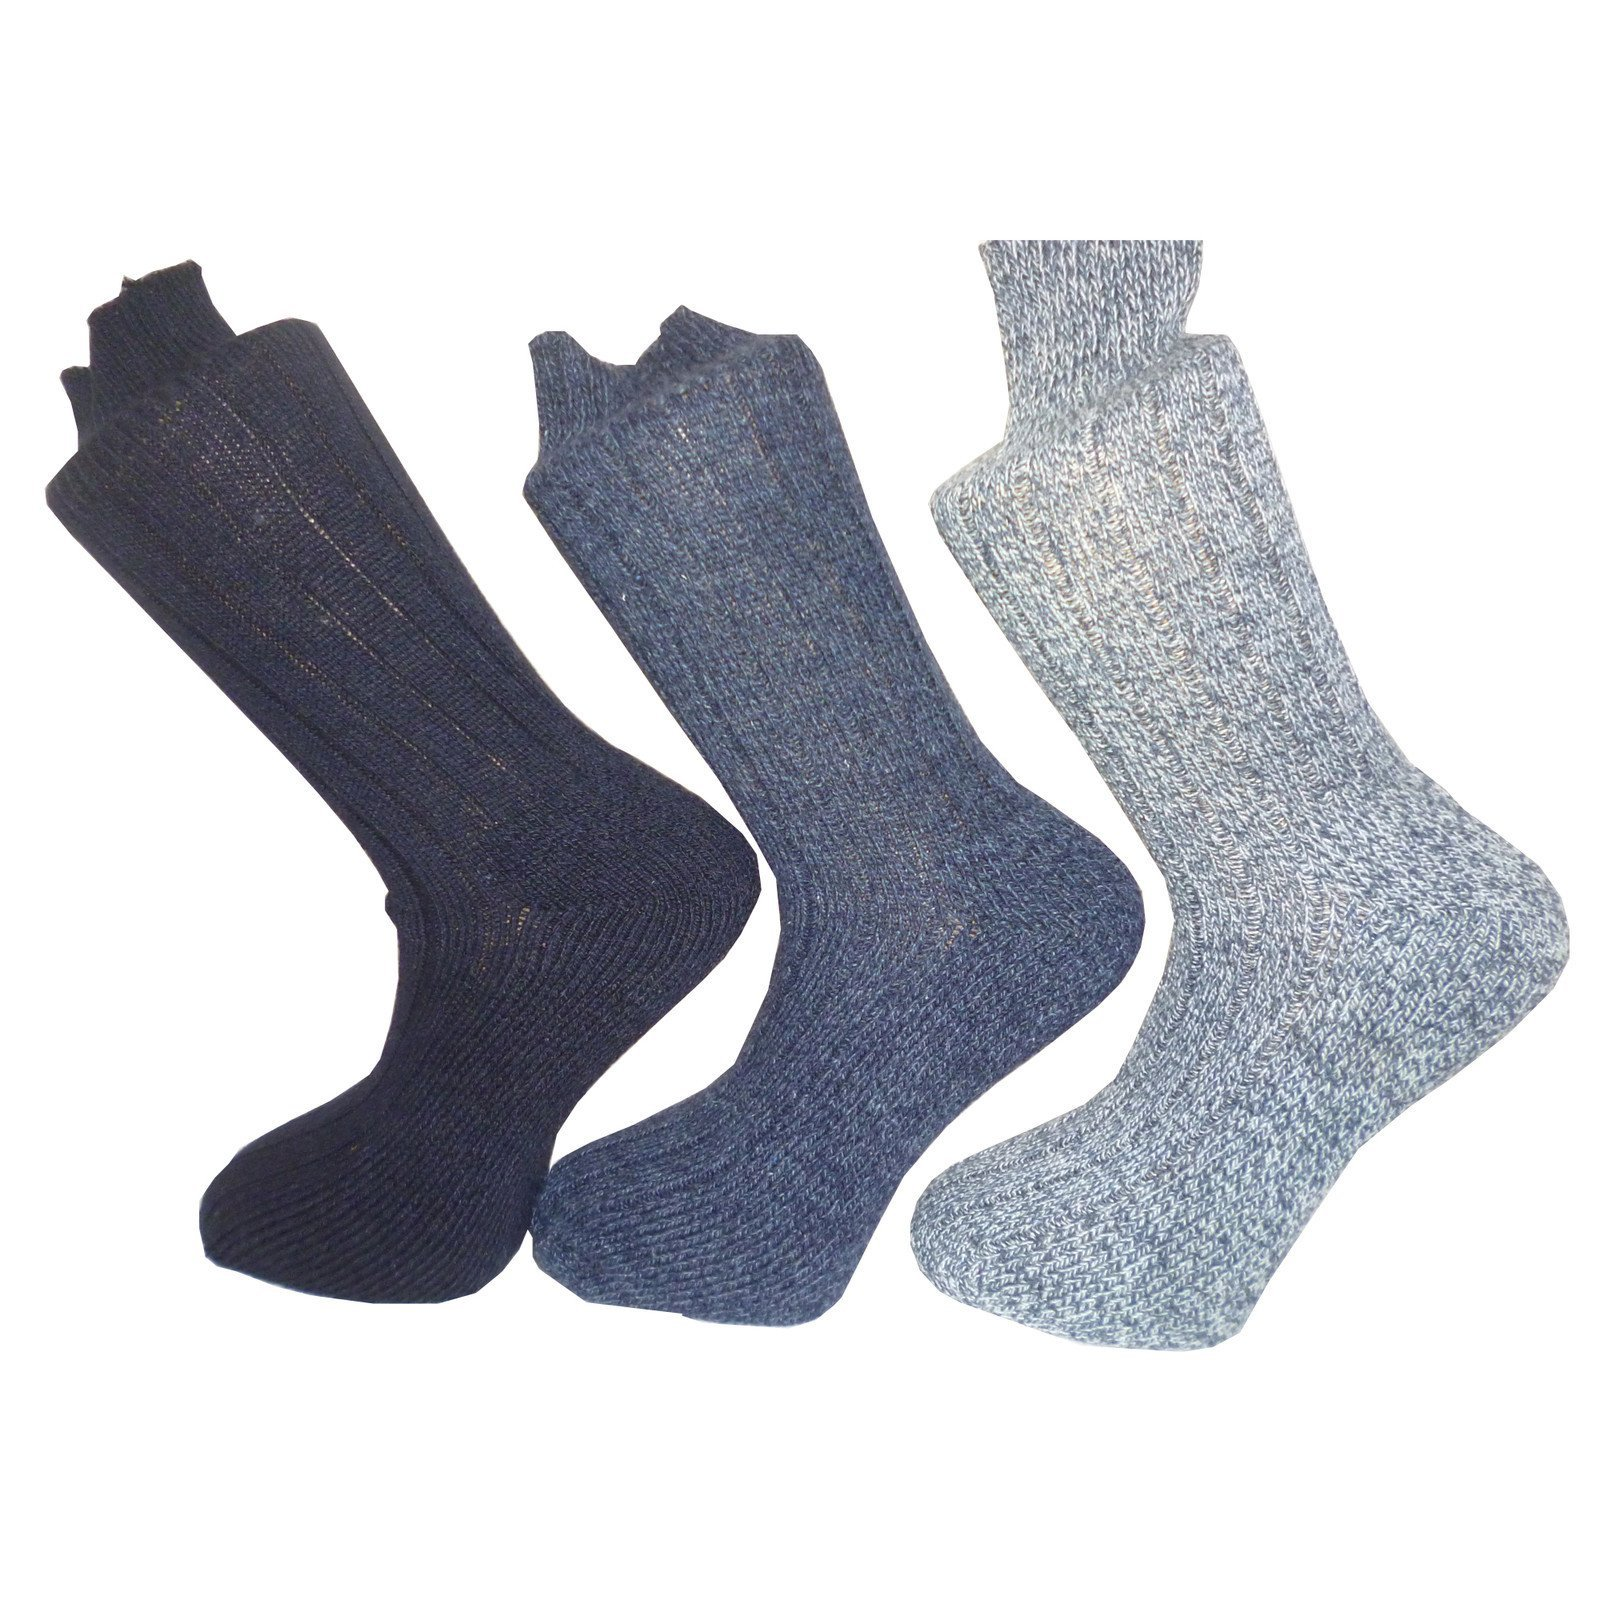 3 pairs mens padded sole wool mix boot socks003.JPG